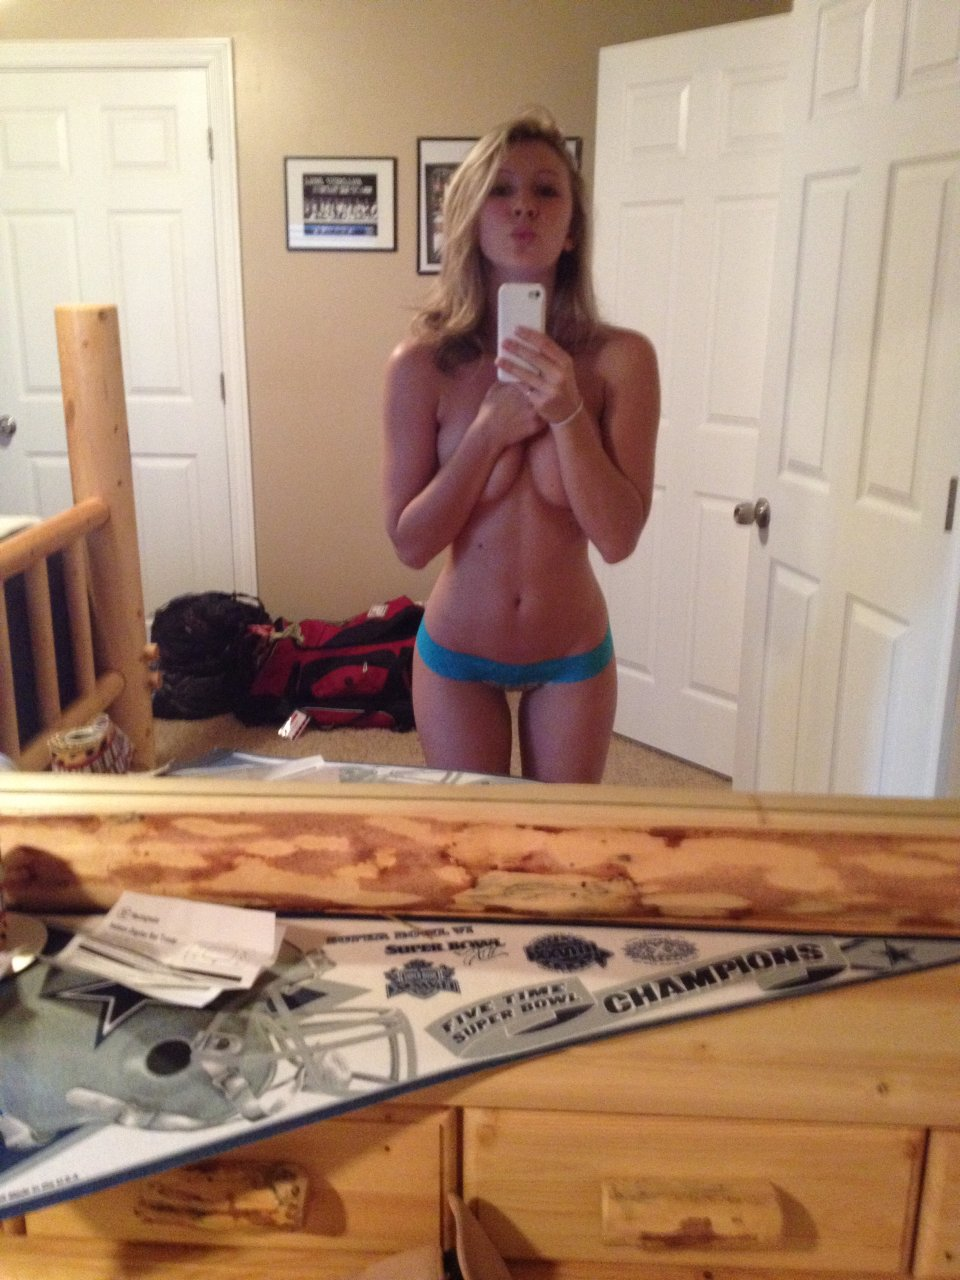 Topless Nfl Cheerleaders Girls Nude Gif